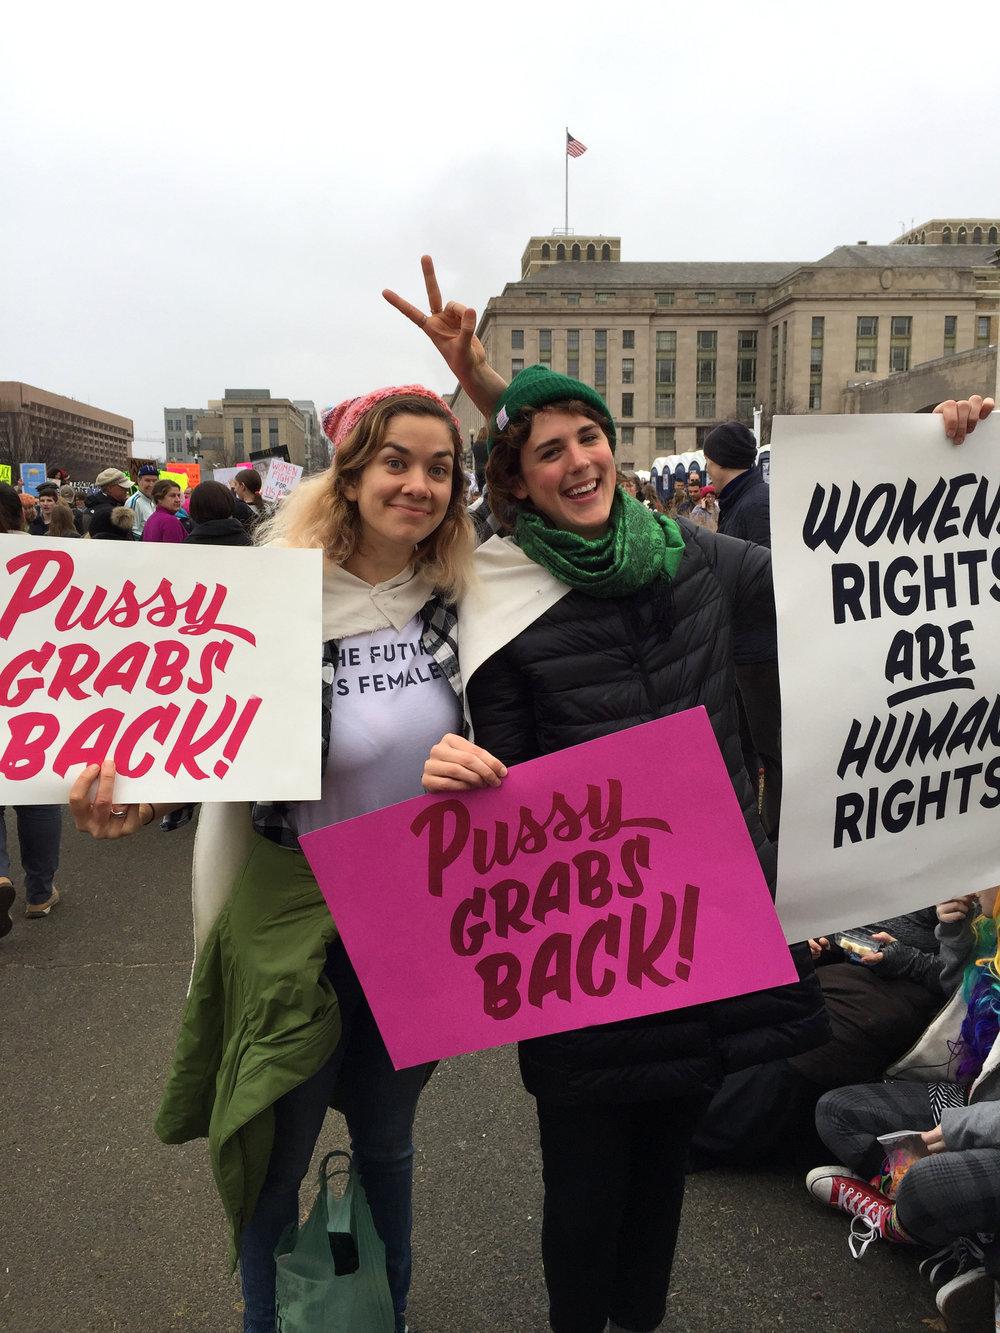 protest_pics3.JPG